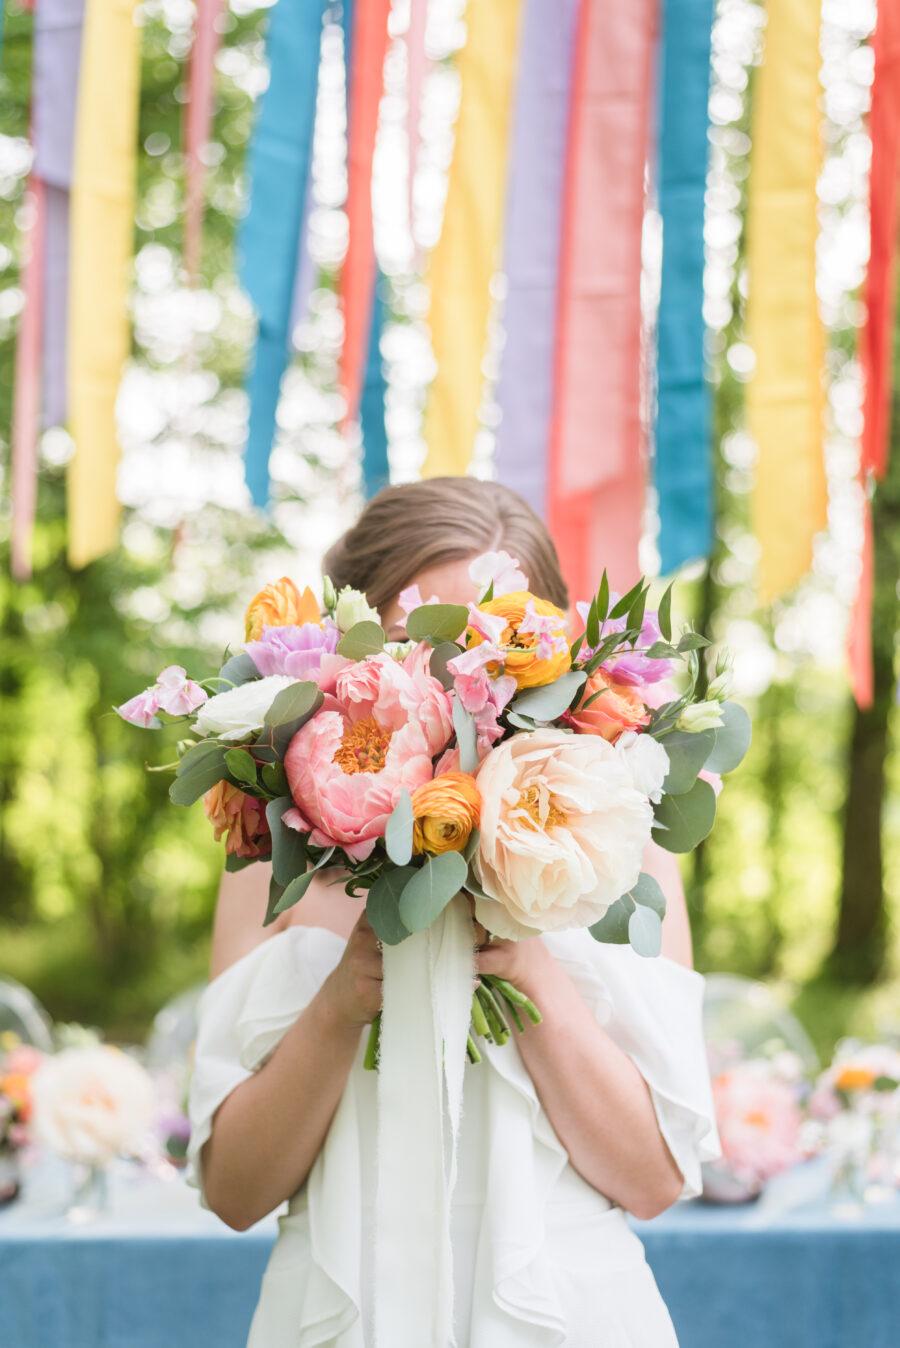 Wedding floral design by LMA Designs